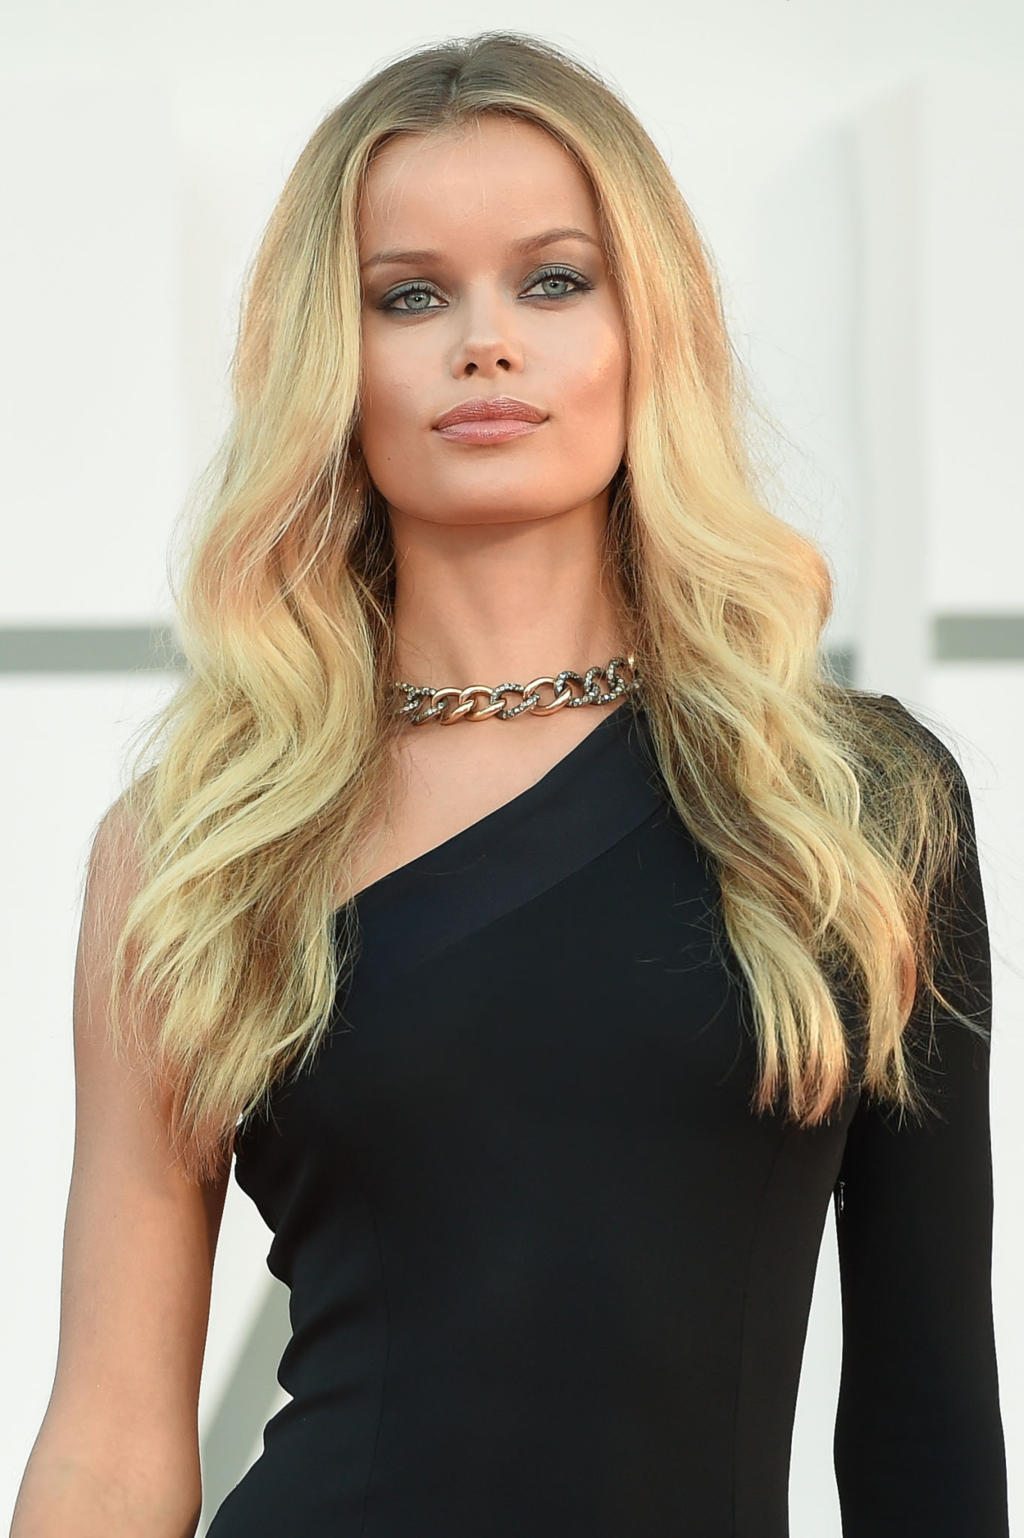 Frida Aasen: Hair by Massimo Serini Make Up By Stanislao Iafulli - Venice Film Festival 2020